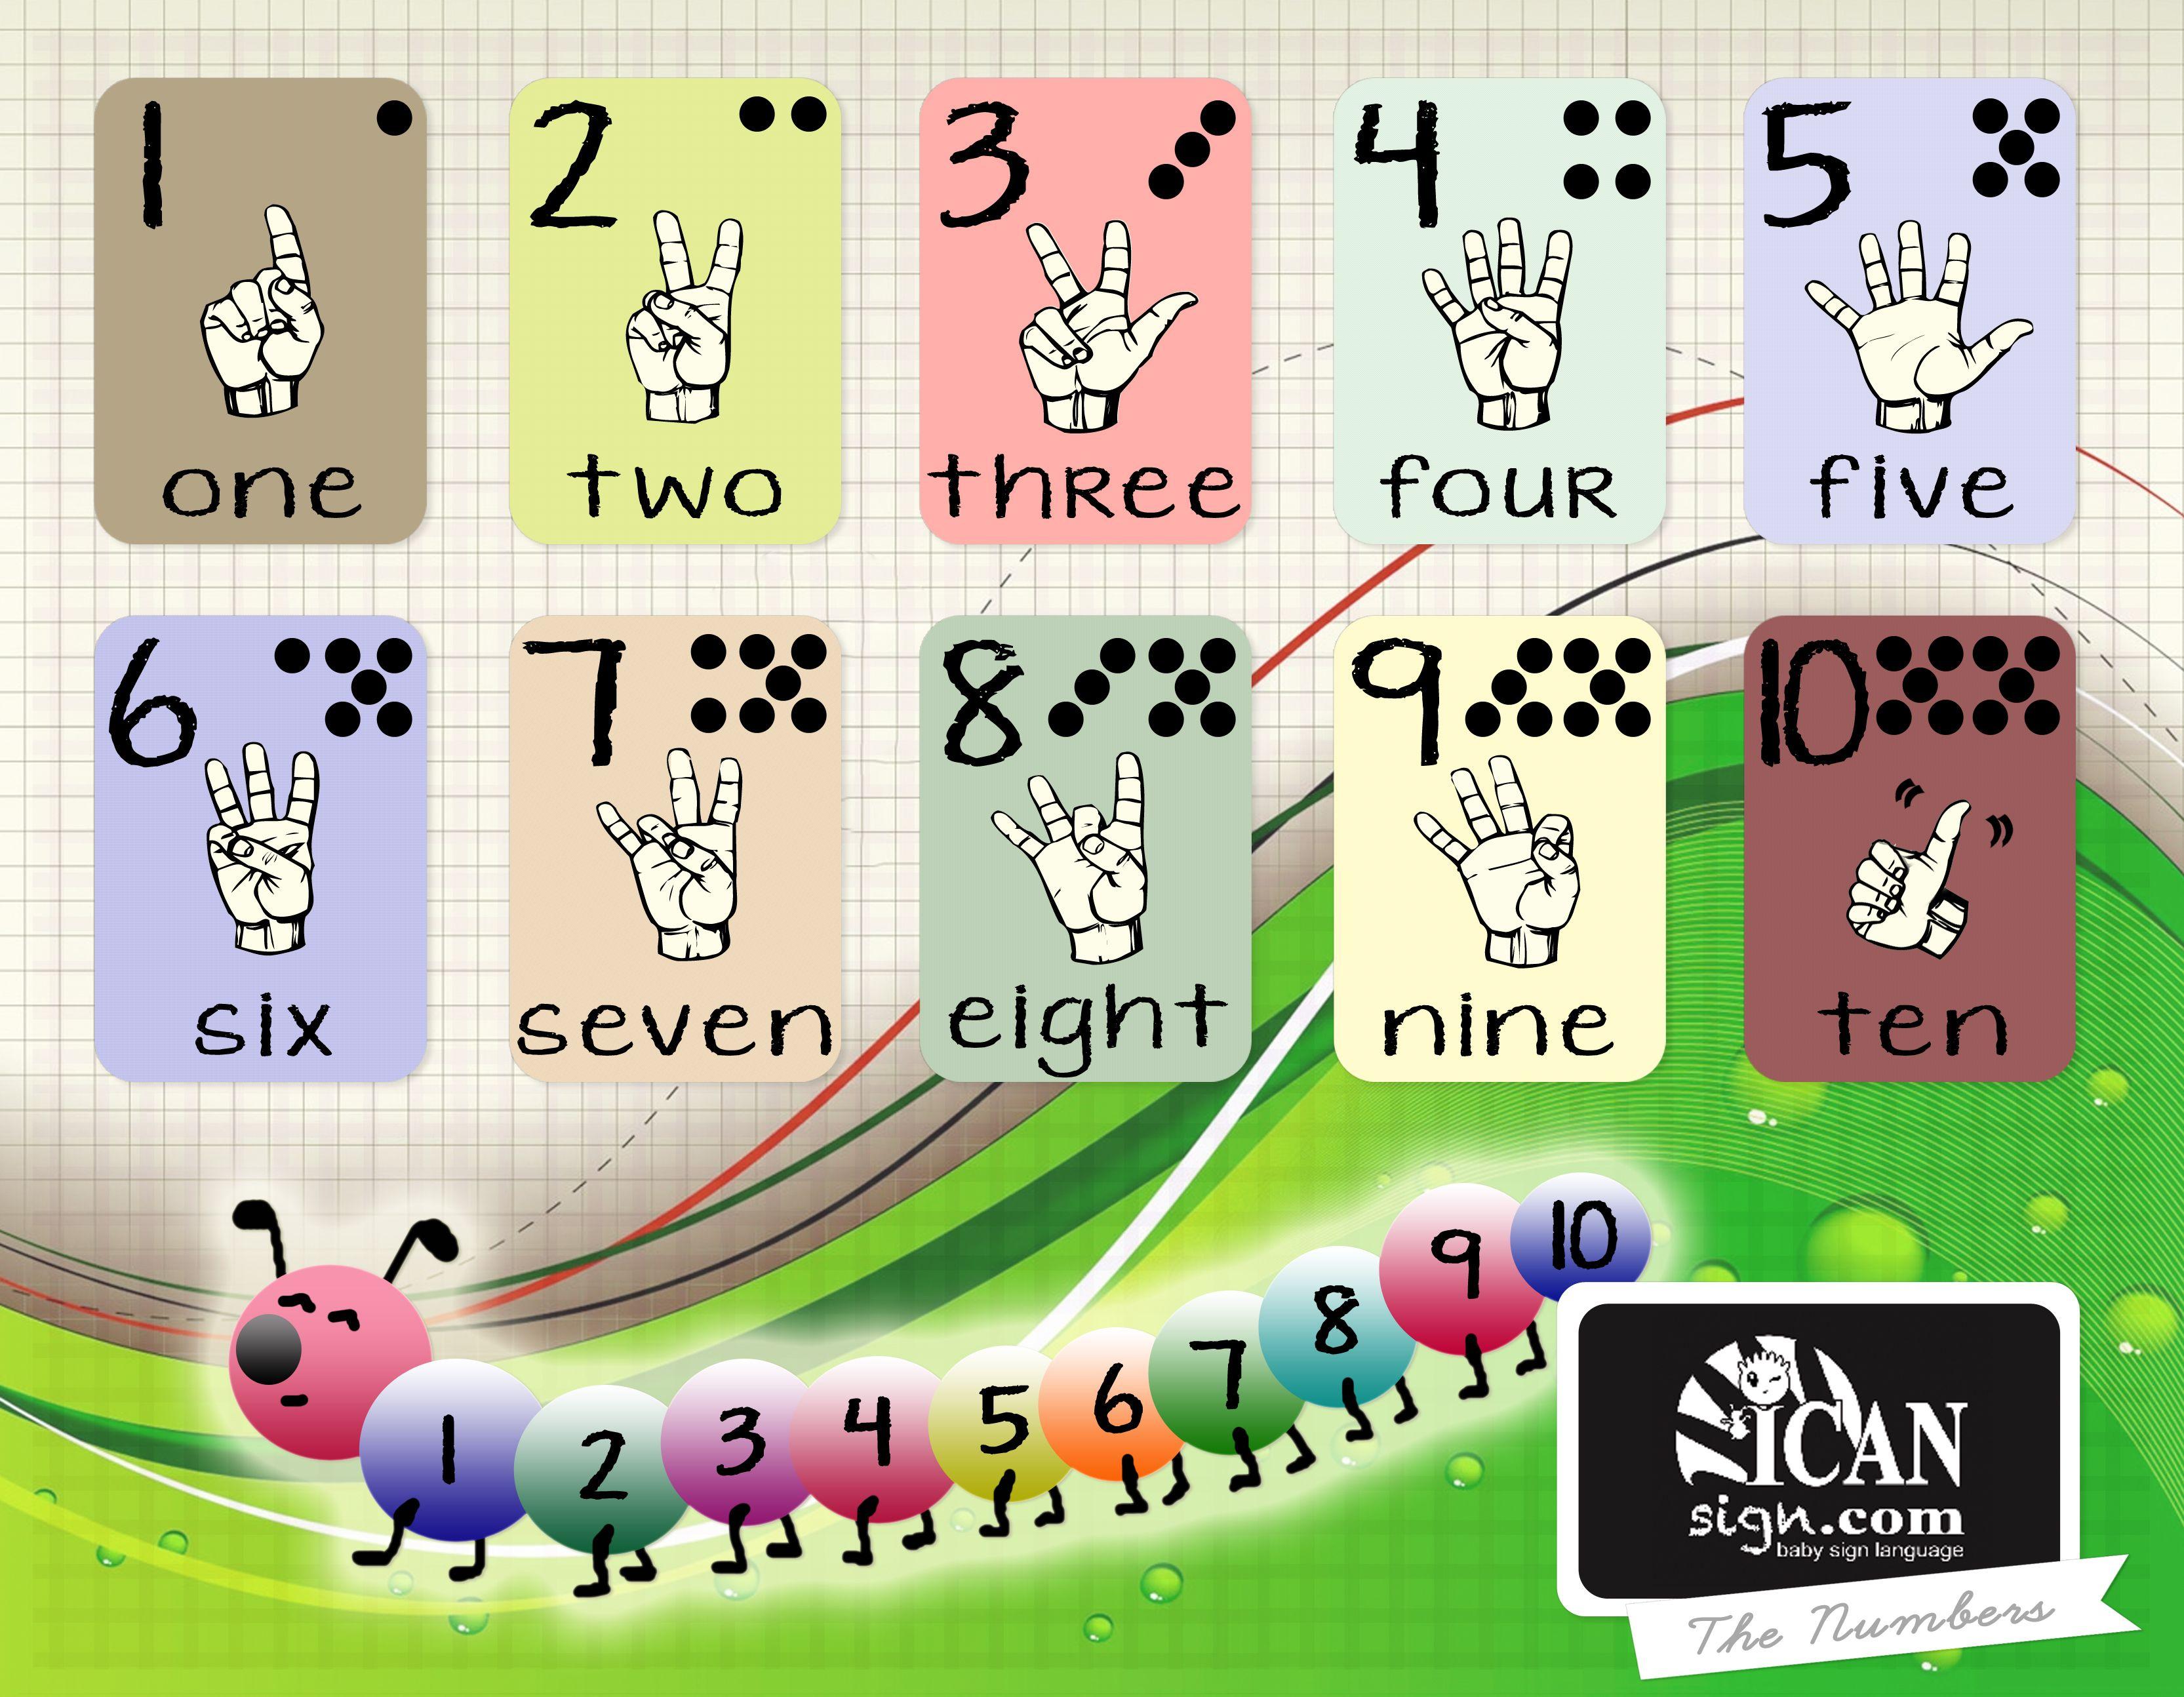 Full Color ASL numbers chart aslnumbers aslnumberschart